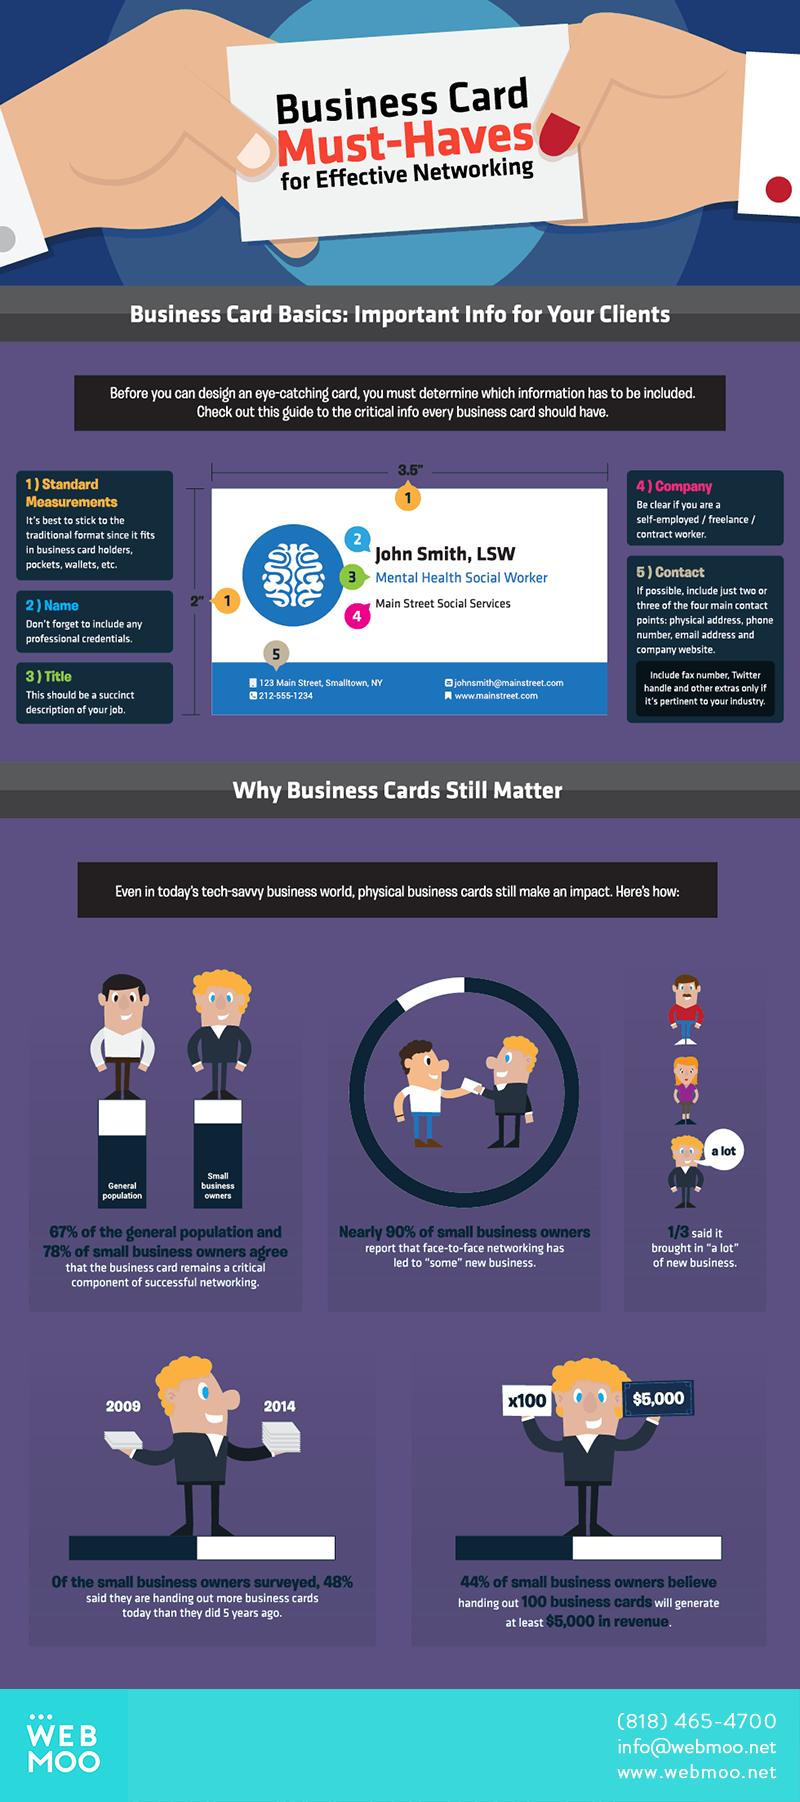 WEBMOO | Los Angeles Web Design Studio | Business Card Must-Haves ...